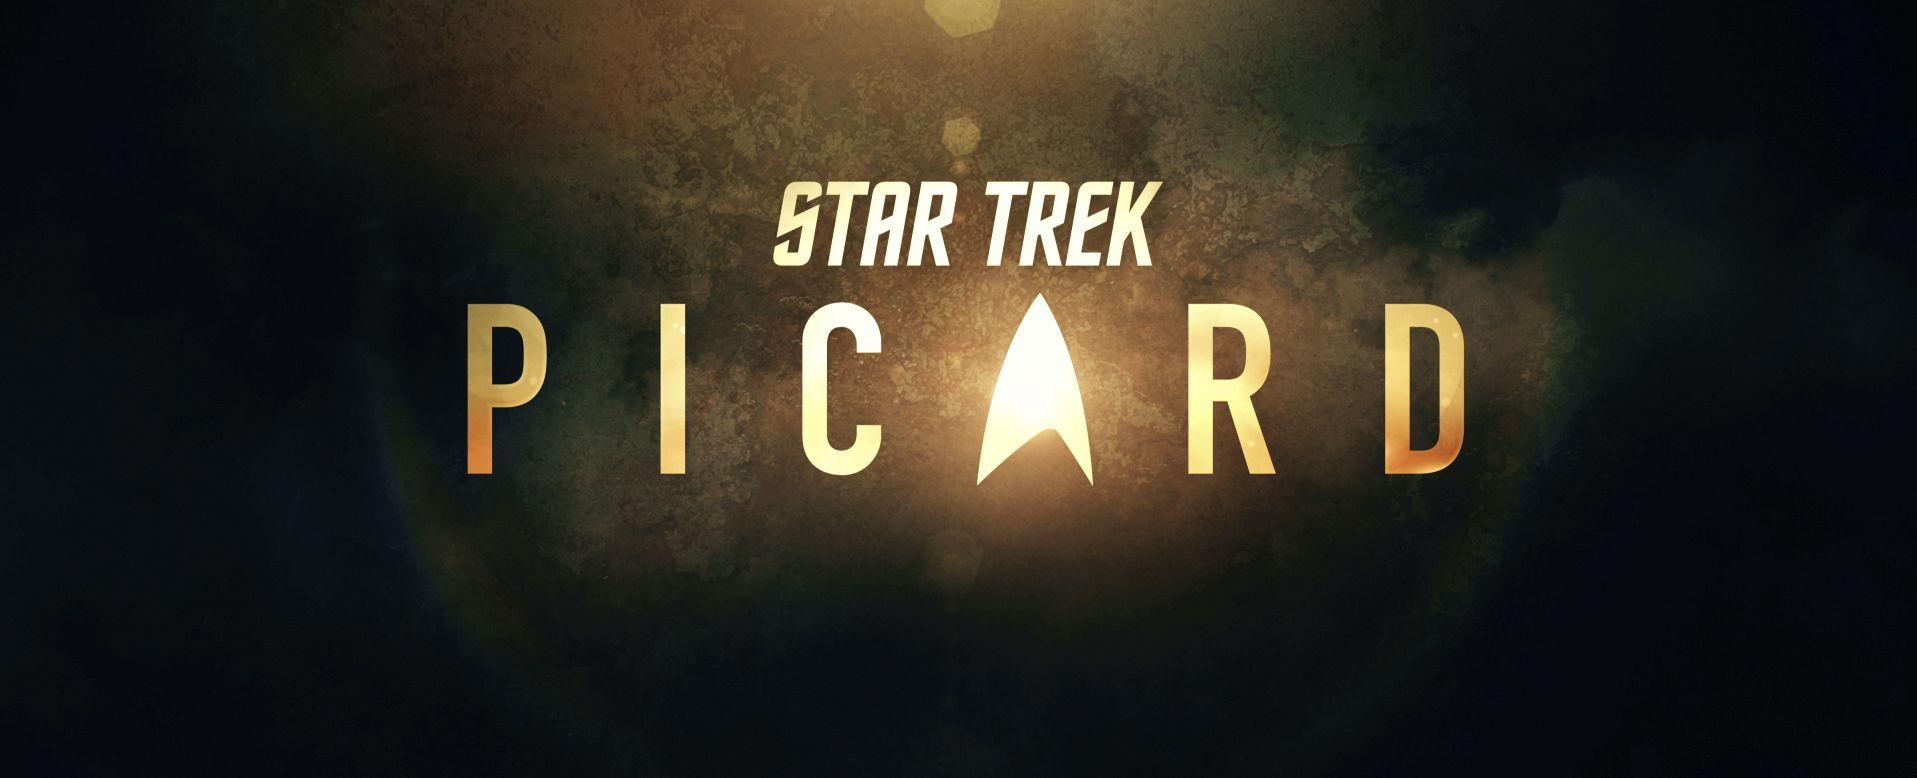 star trek: picard - photo #20